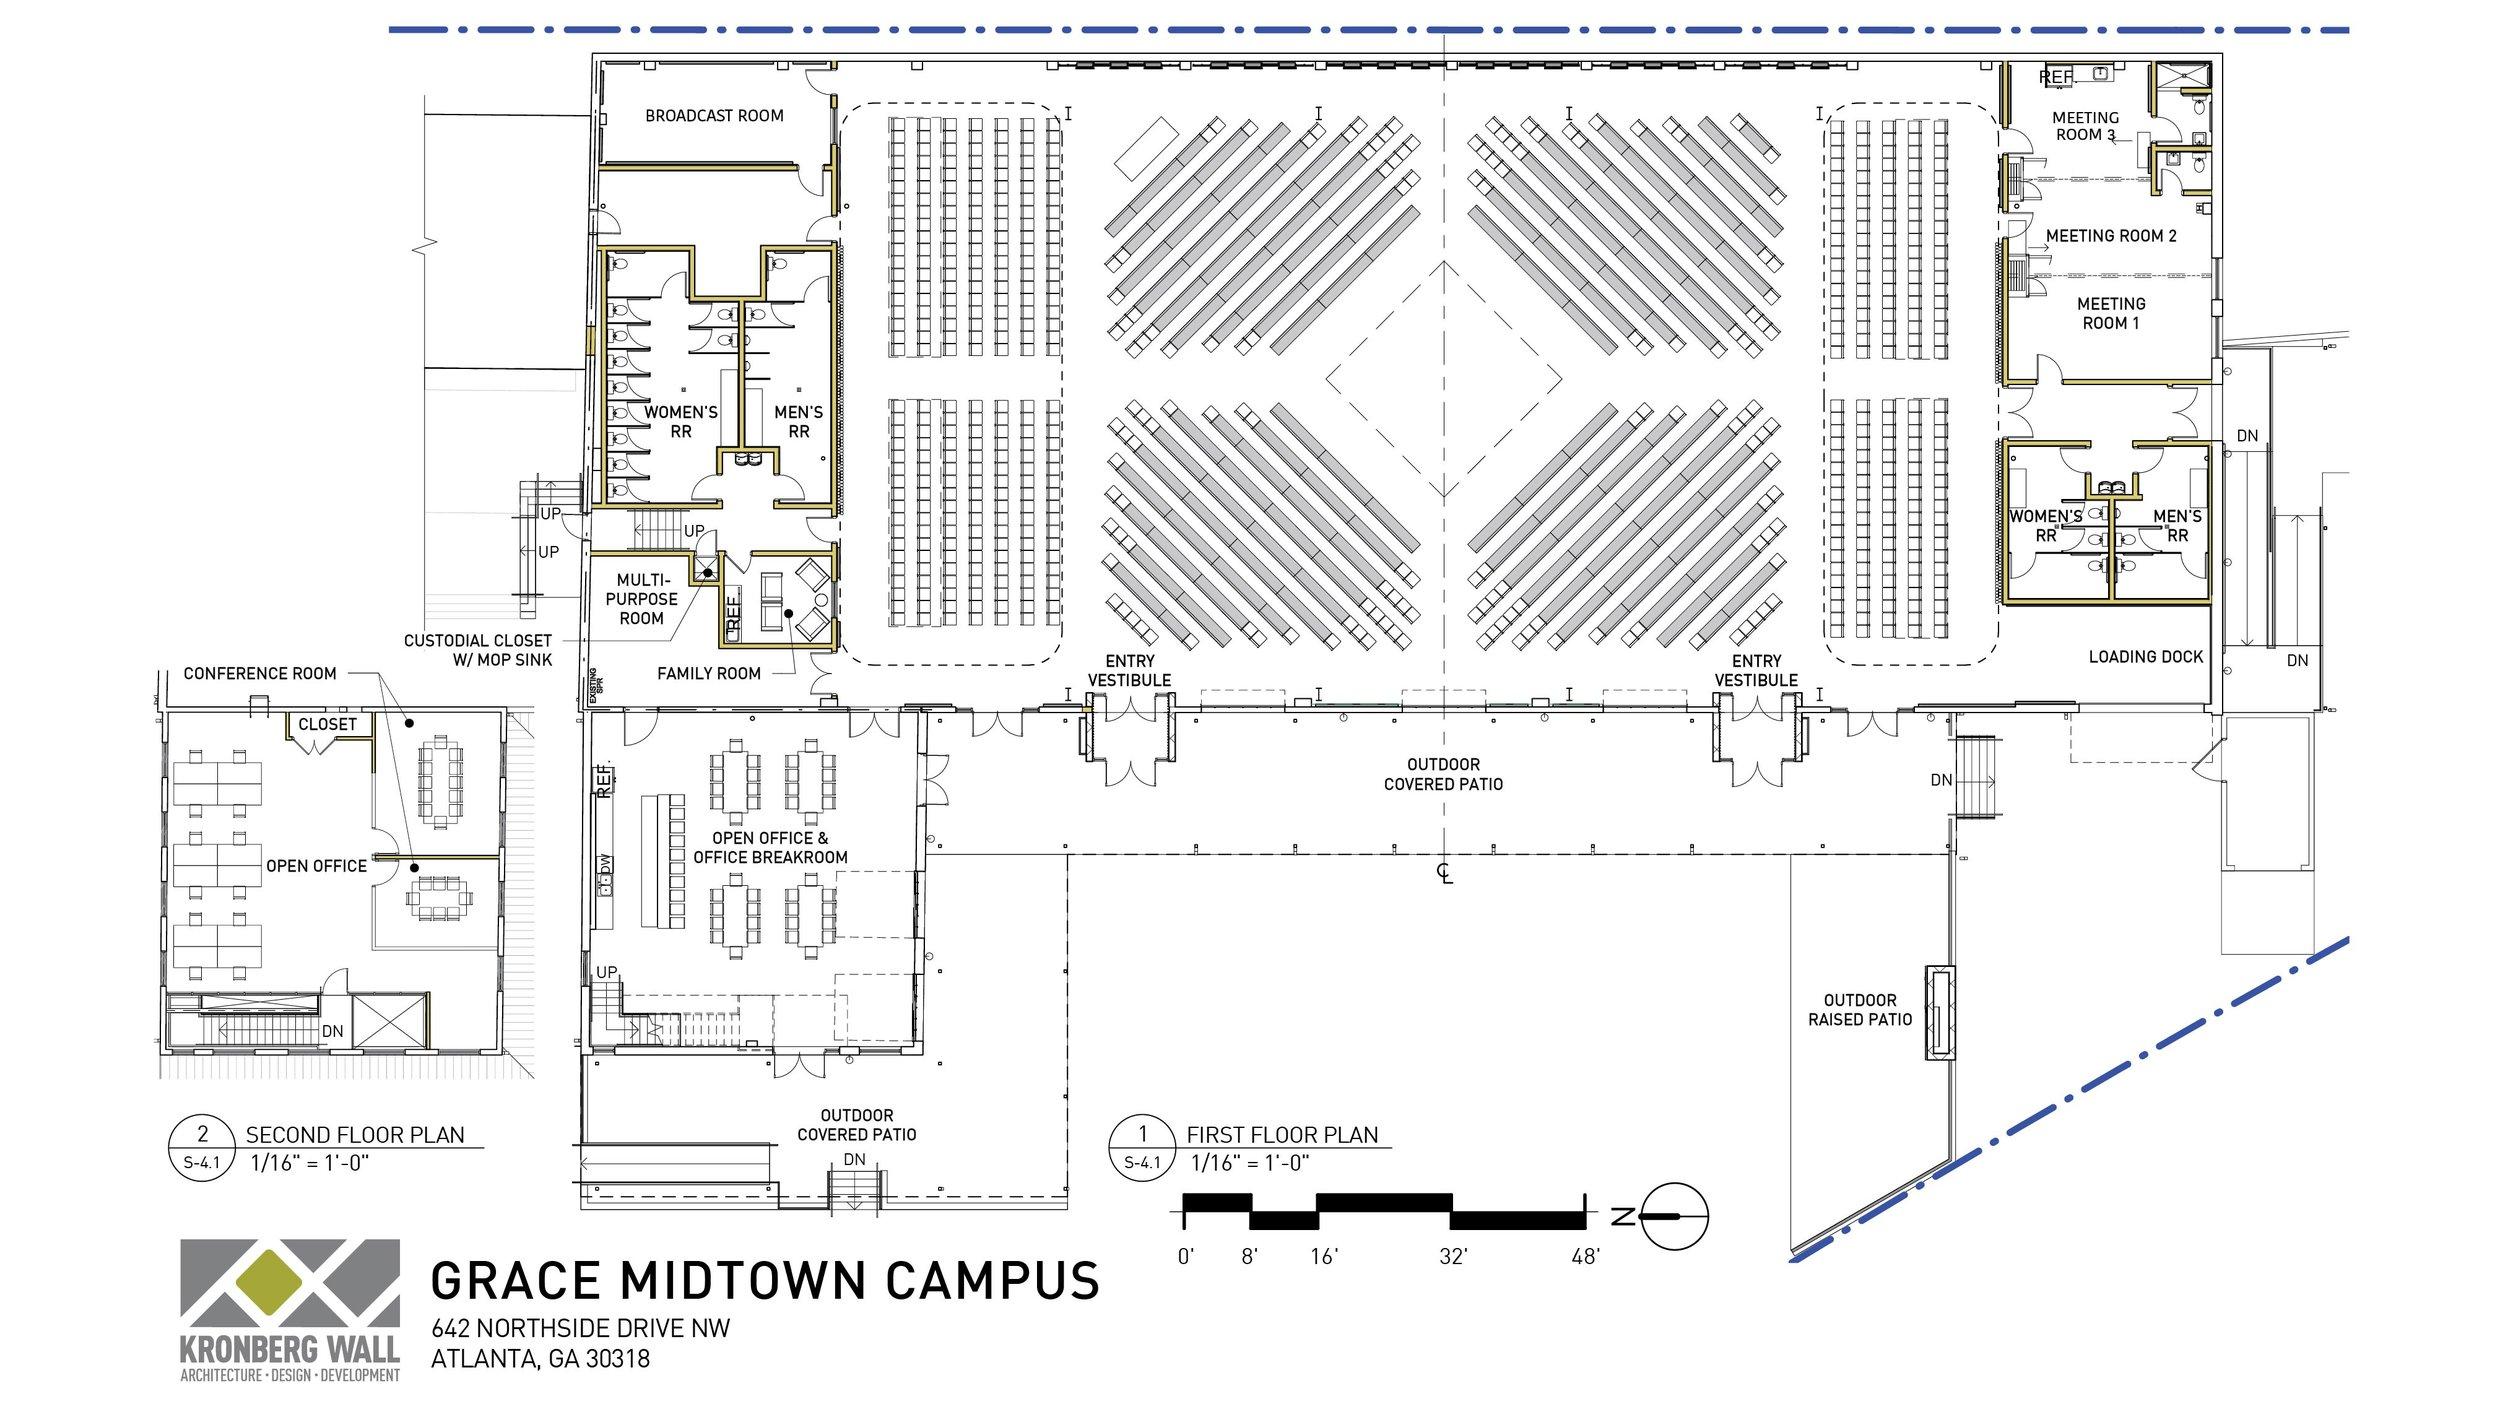 2018_05_18 - Grace Midtown Sunday Meeting - Floor Plans-05.jpg